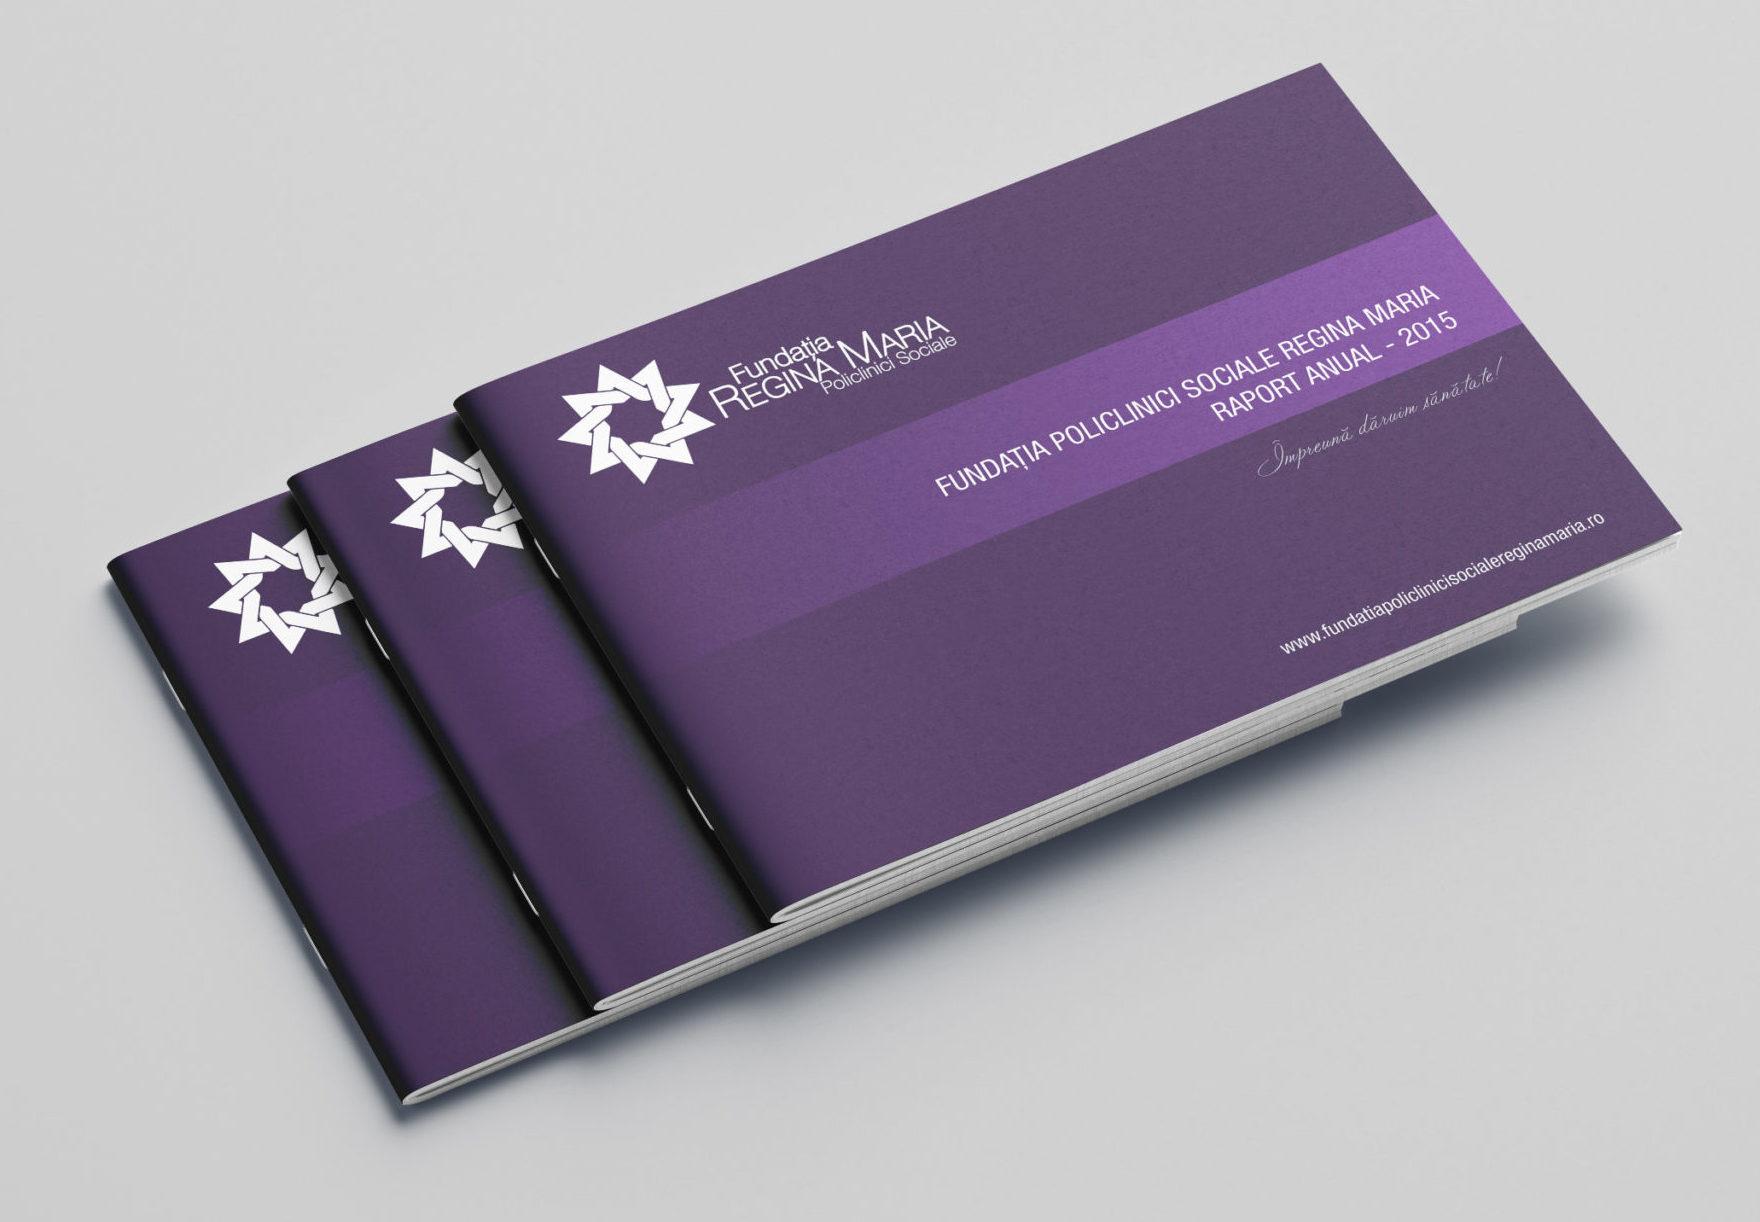 FPSRM-Raport-anual-2015-Stack-01